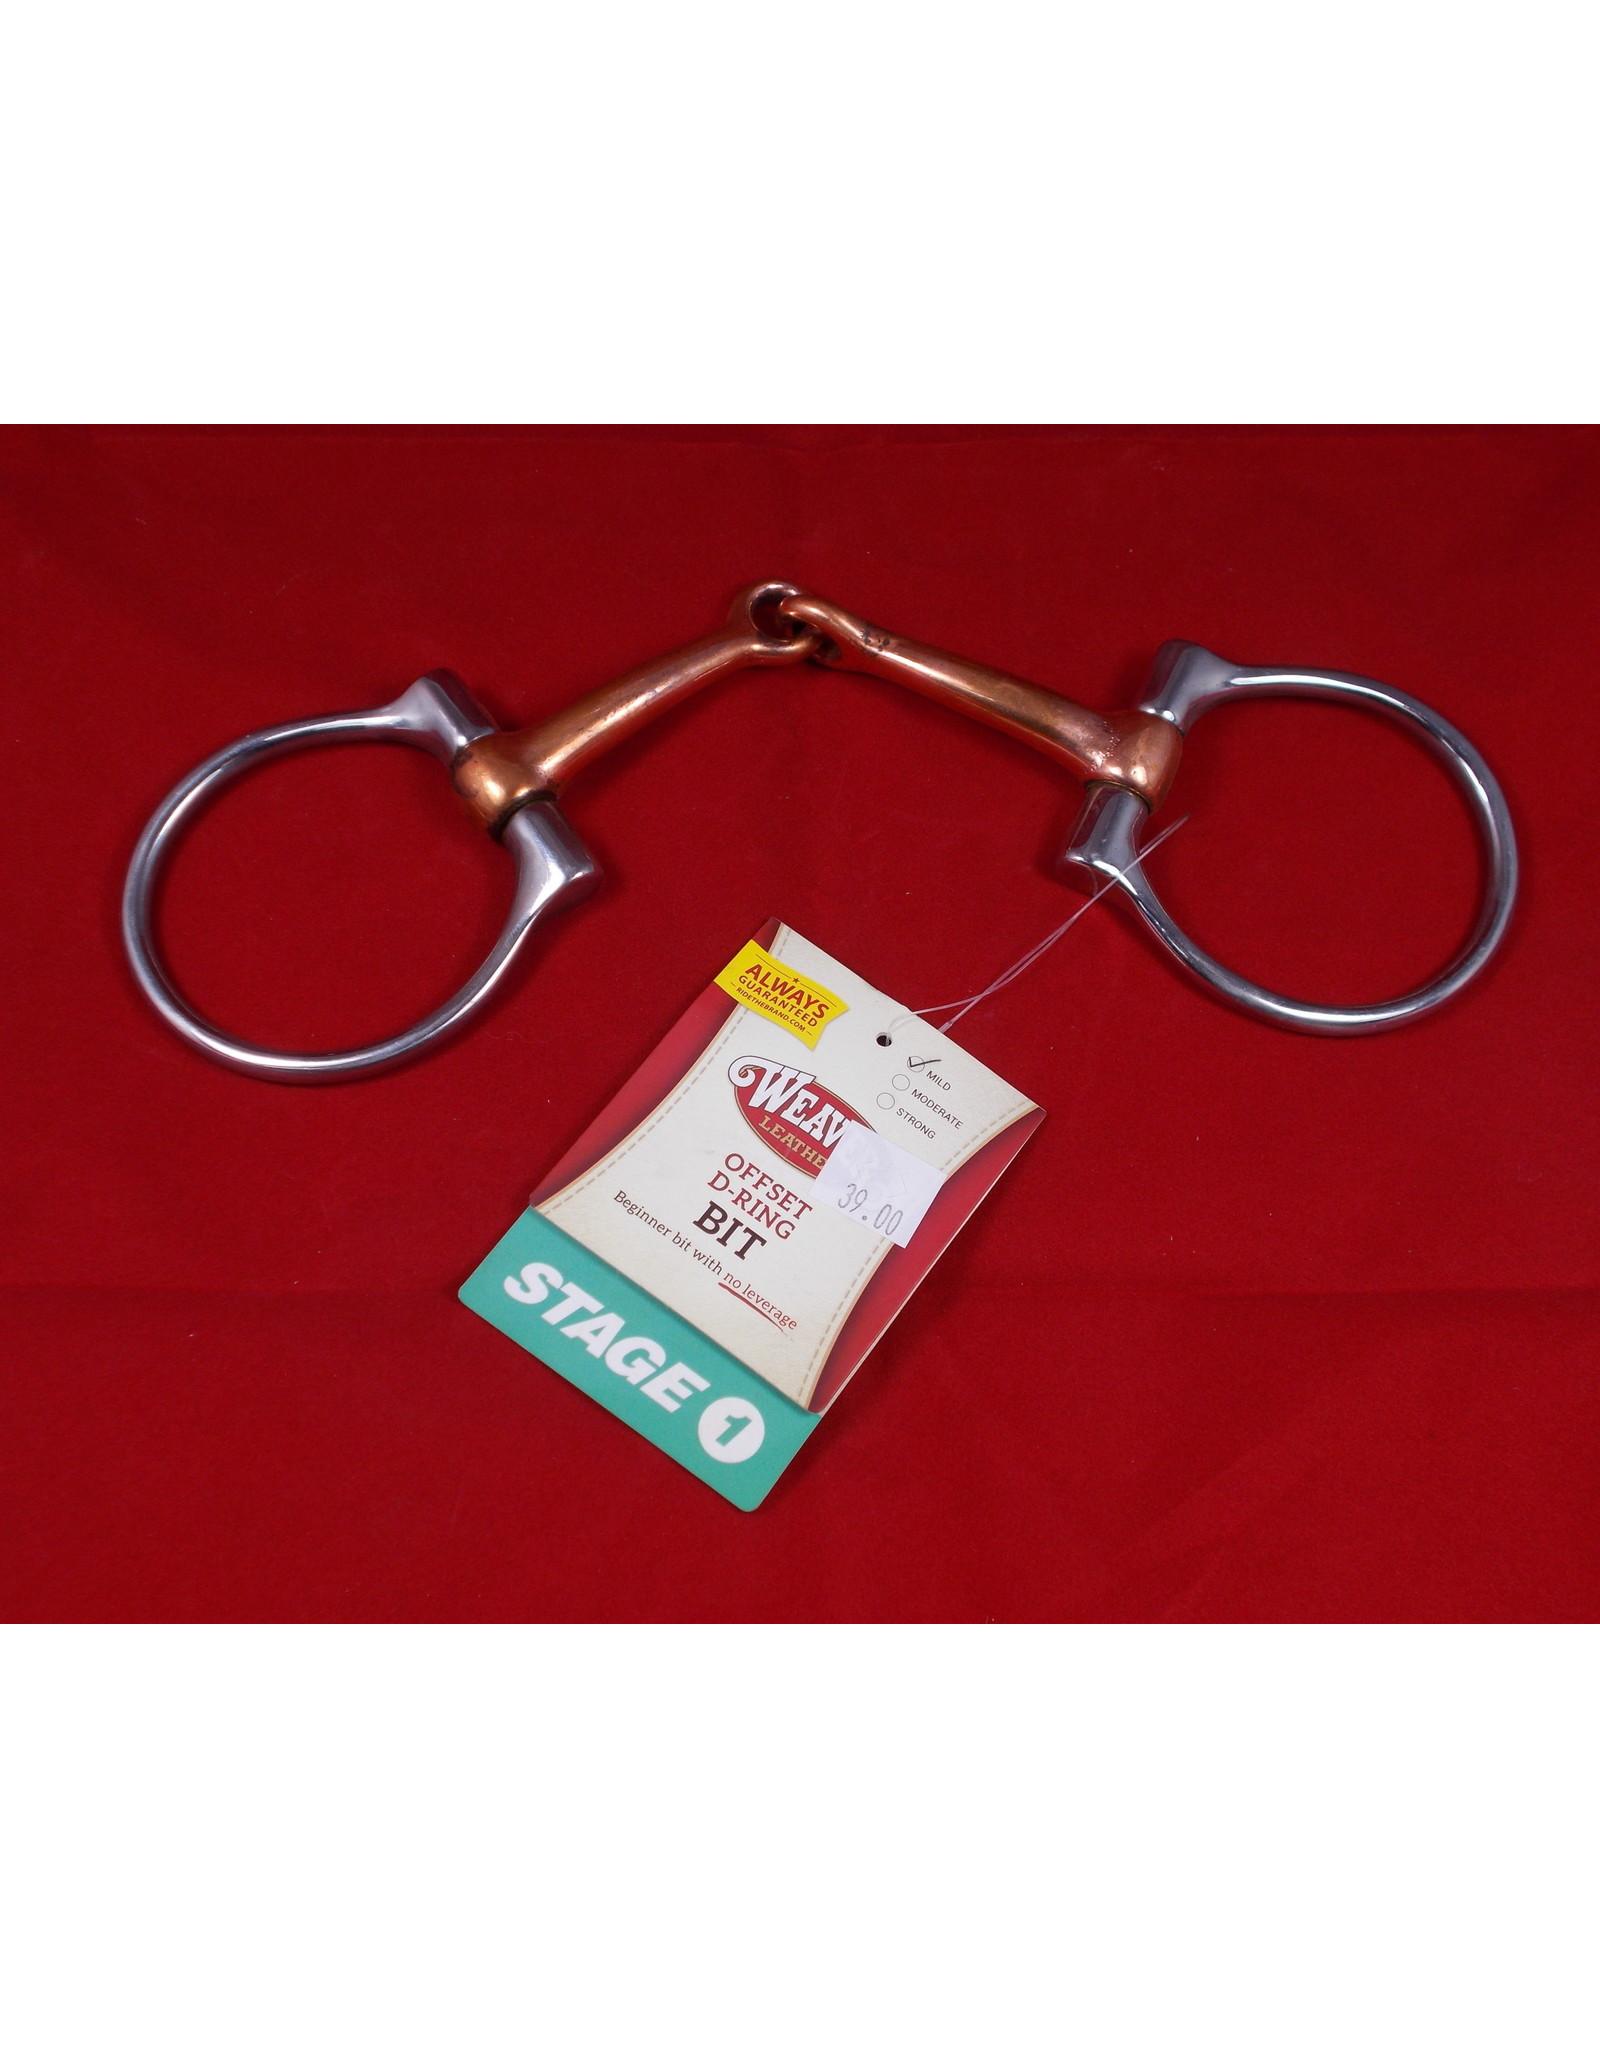 "BIT* Offset D-Ring Bit - Mild No Leverage Stage1 5"" Copper Snaffle 25-5740"